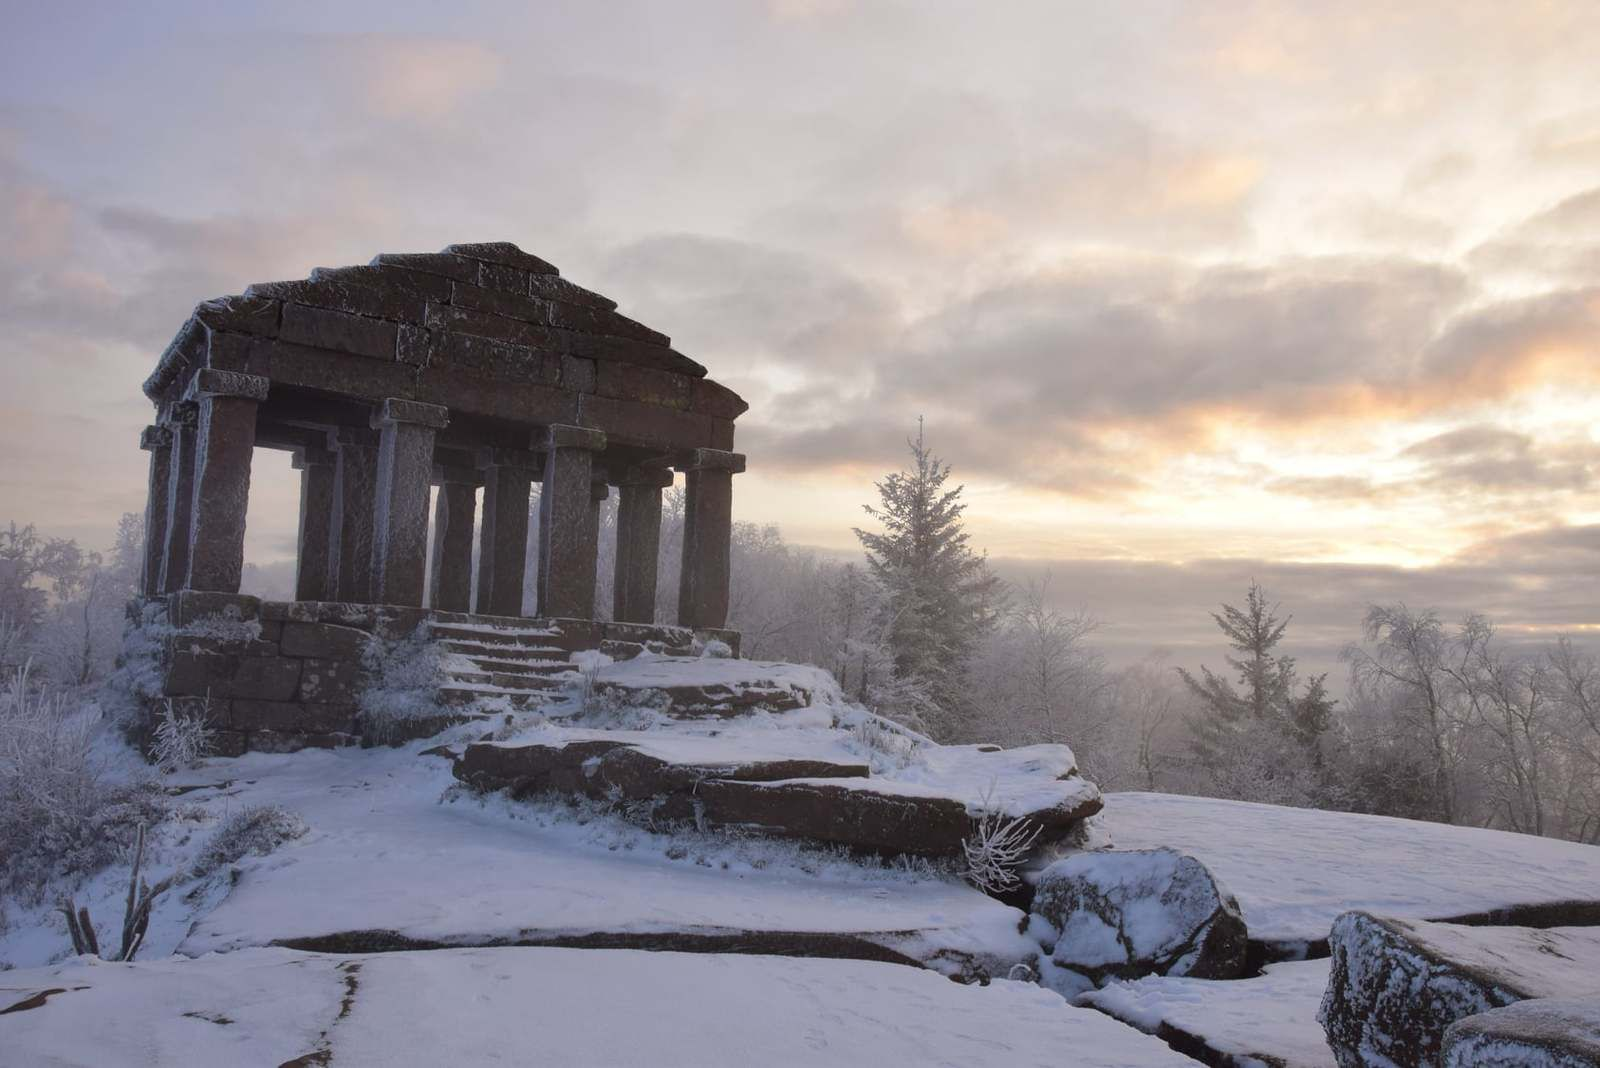 Dans la magie d'un matin d'hiver